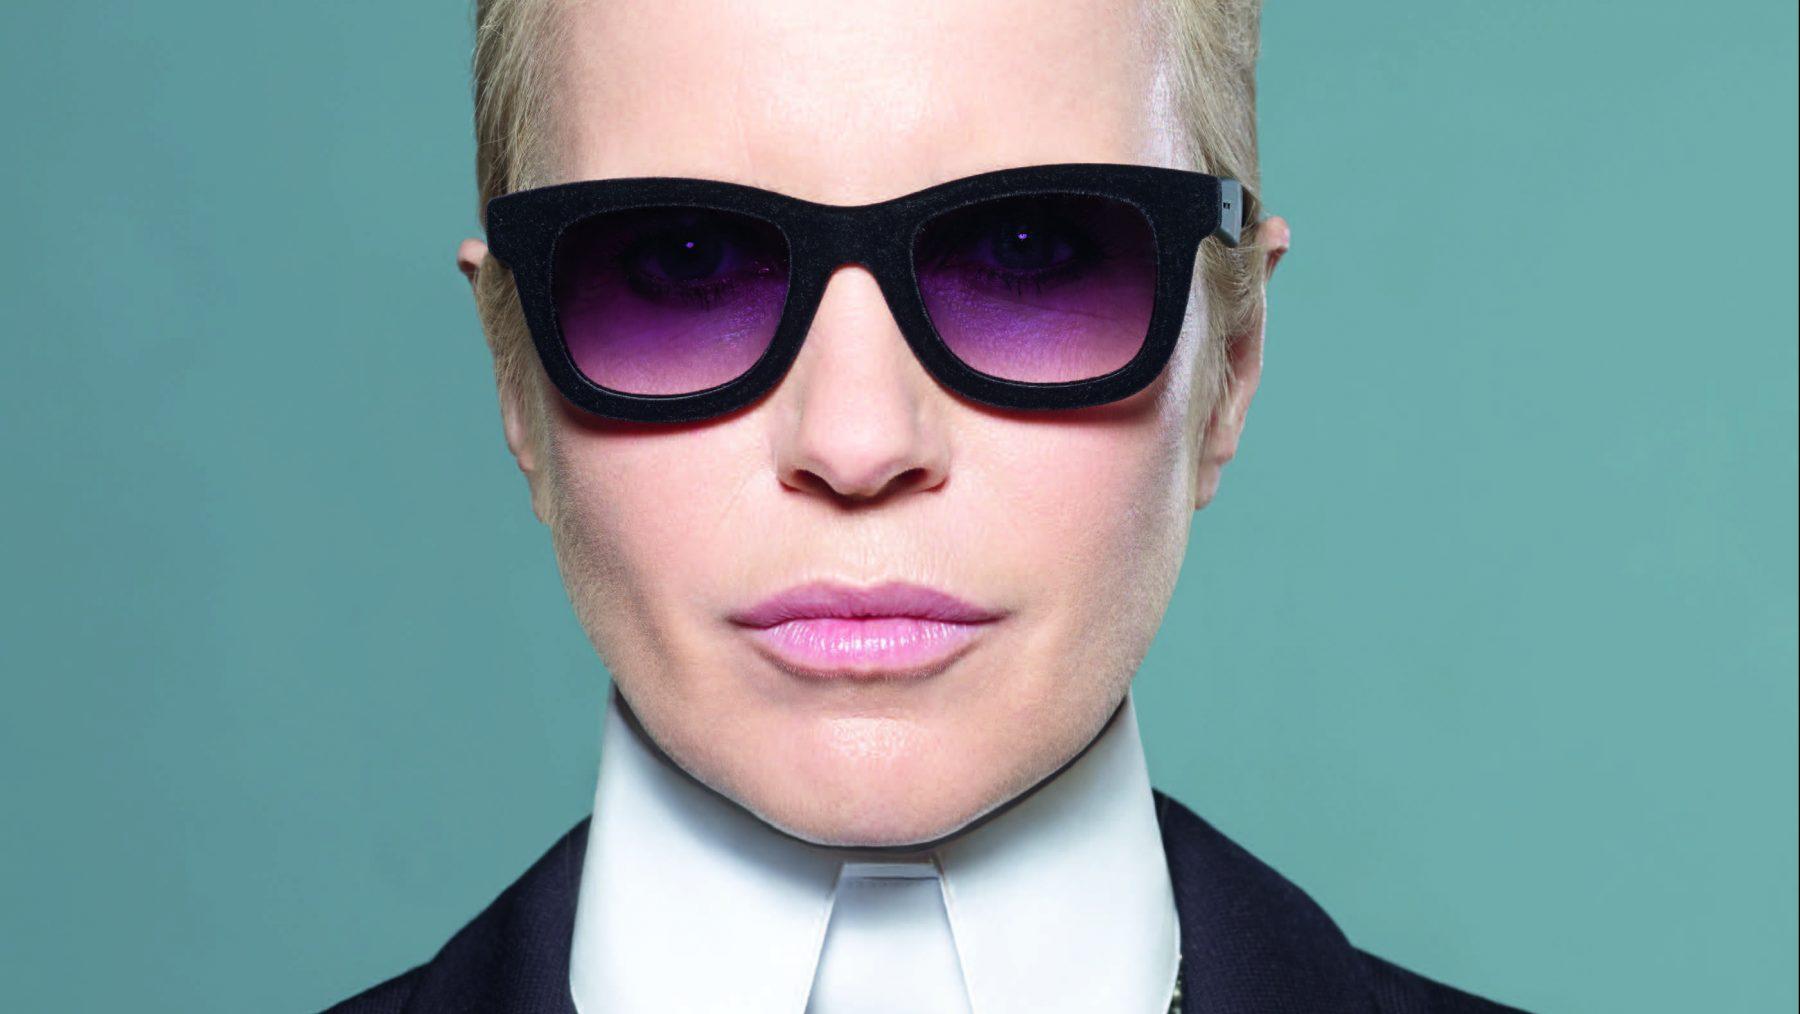 Linda als Karl Lagerfeld